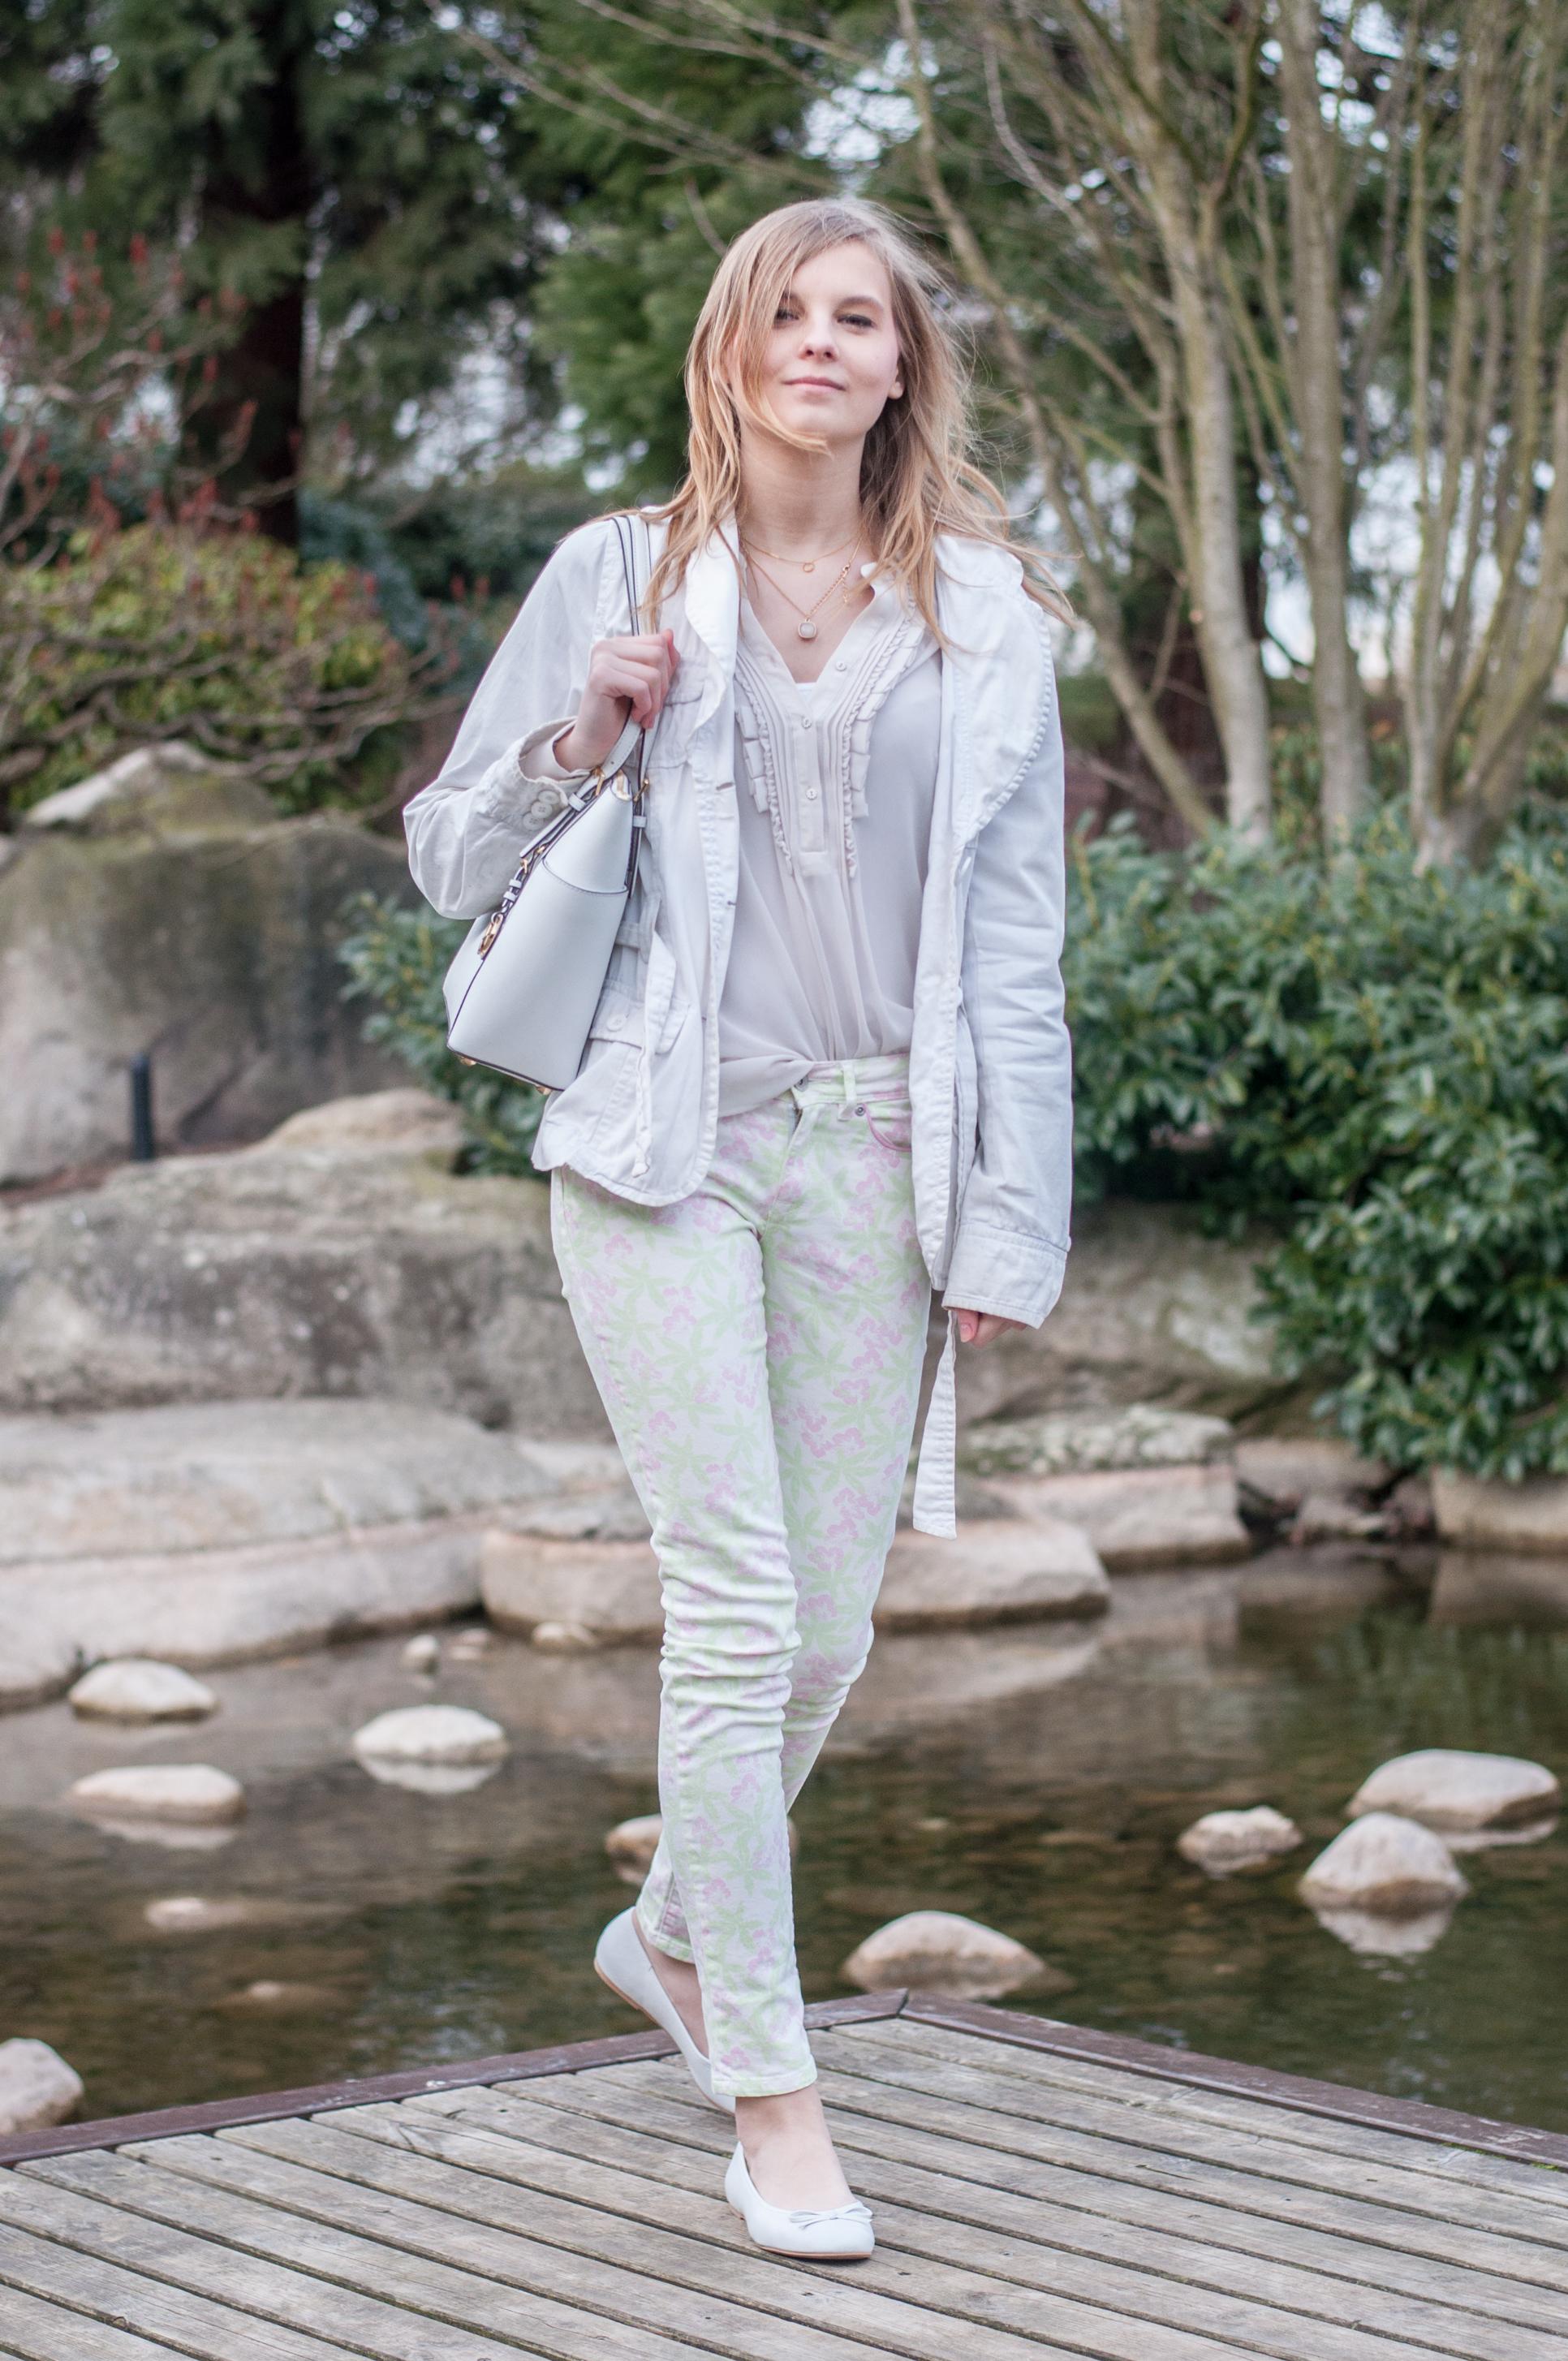 OUTFIT | Mein erstes Outfit mit der Michael Kors-Tasche